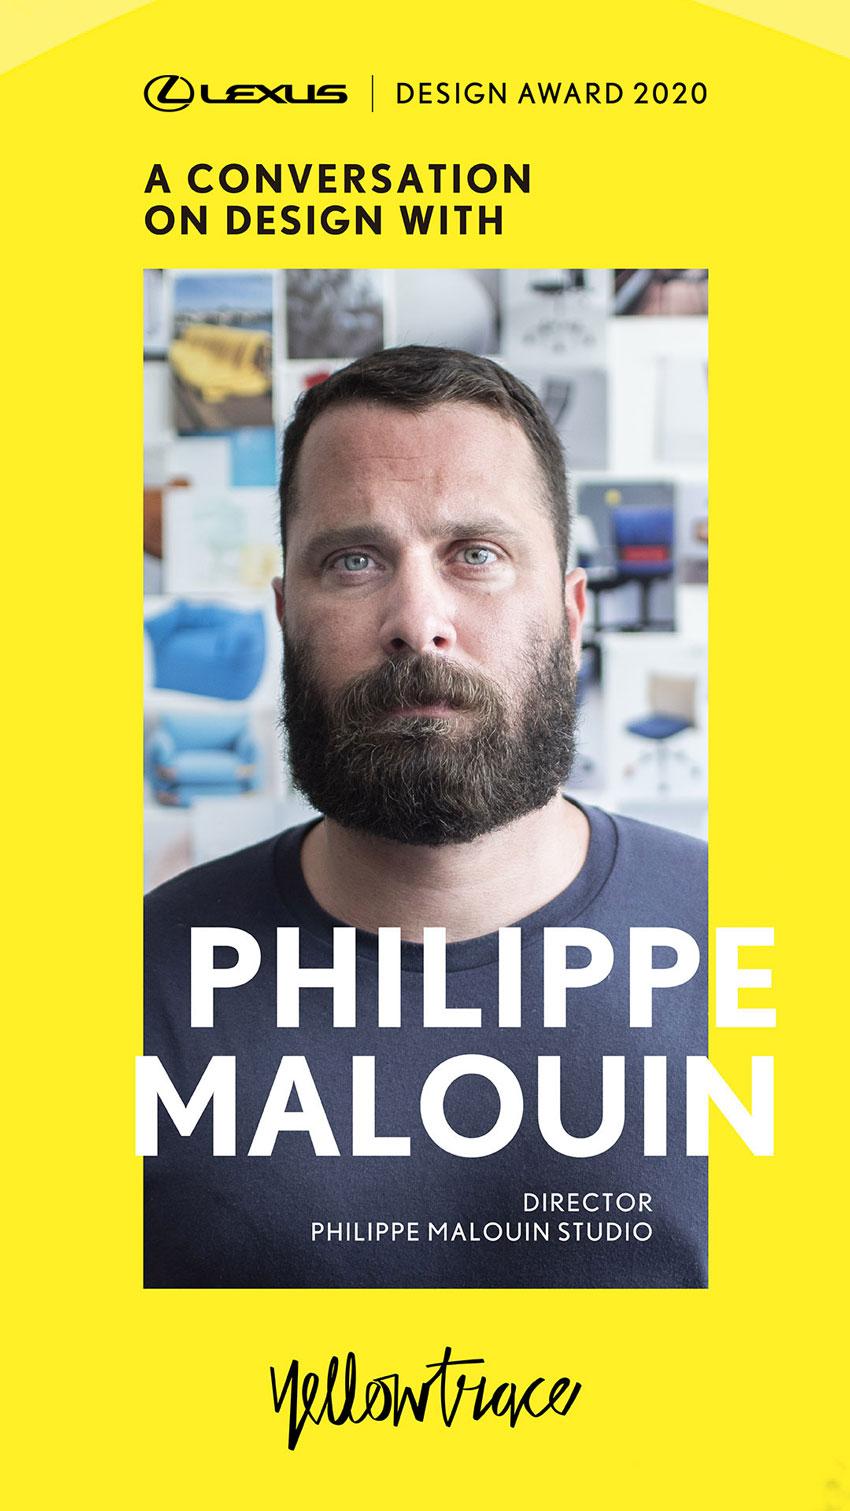 Yellowtracexlexus Philippe Malouin Dana Tomic Hughes Ig Live